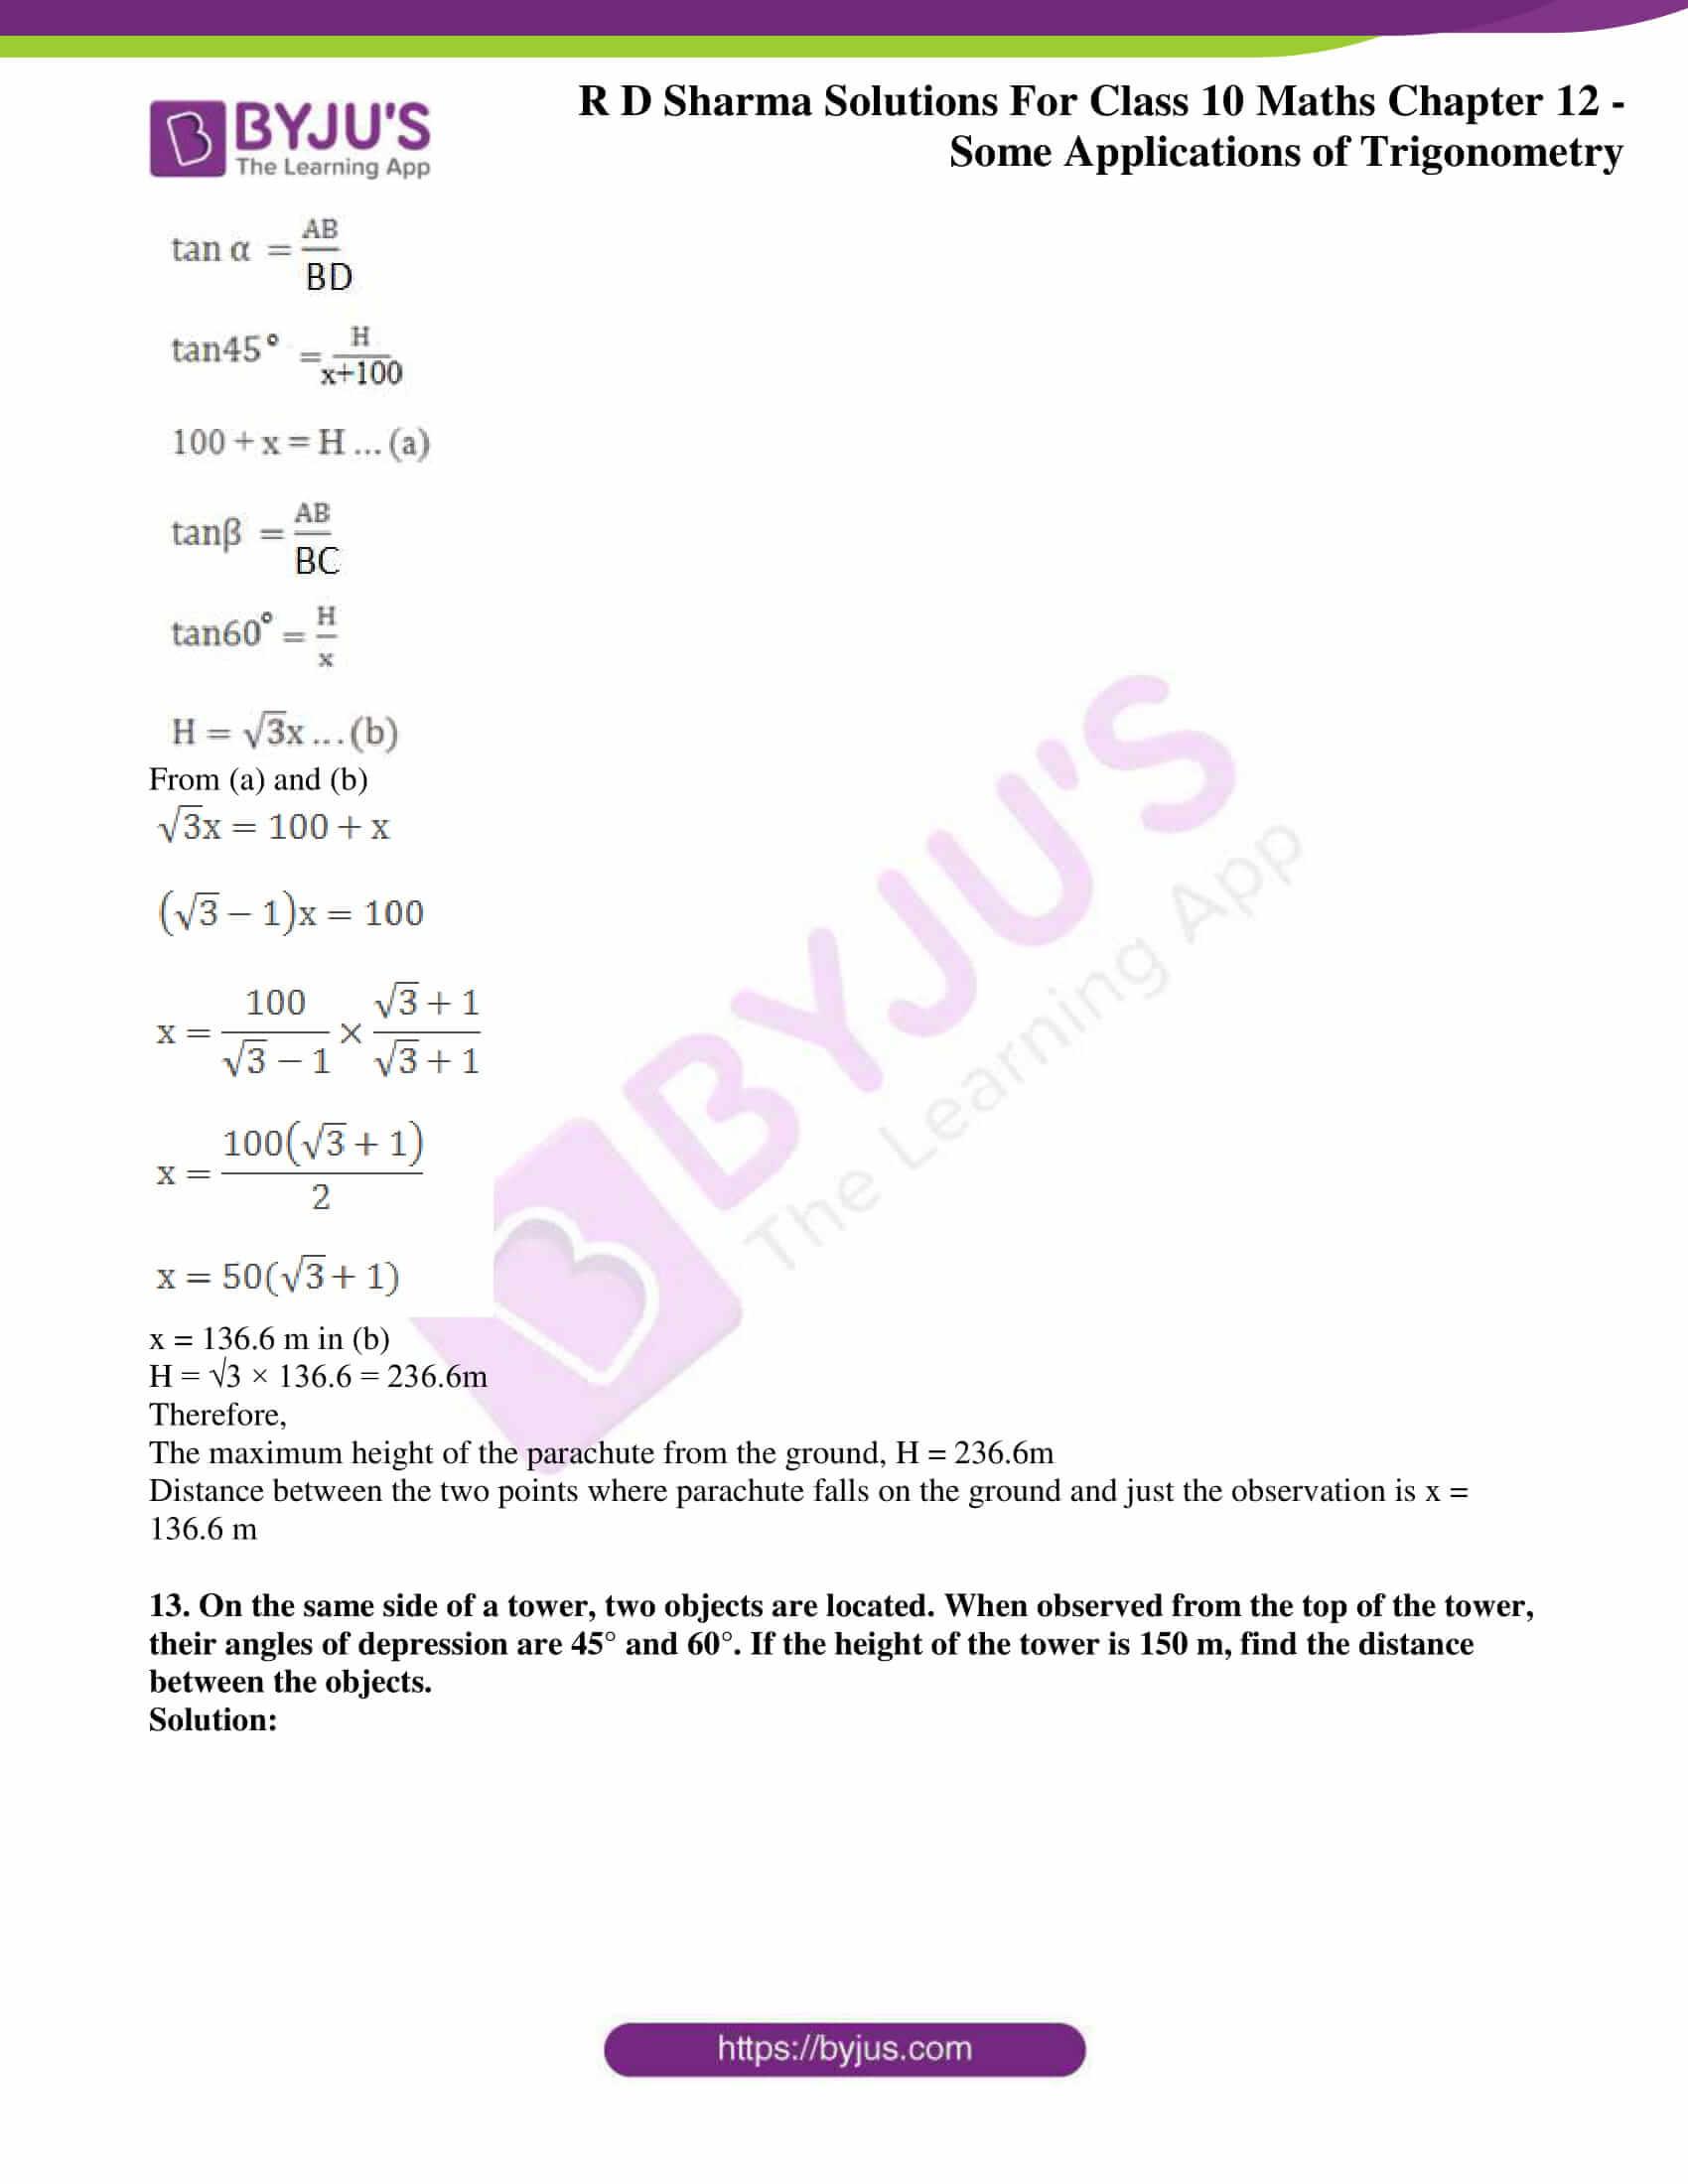 rd sharma class 10 chapter 12 applications trigonometry solutions 11